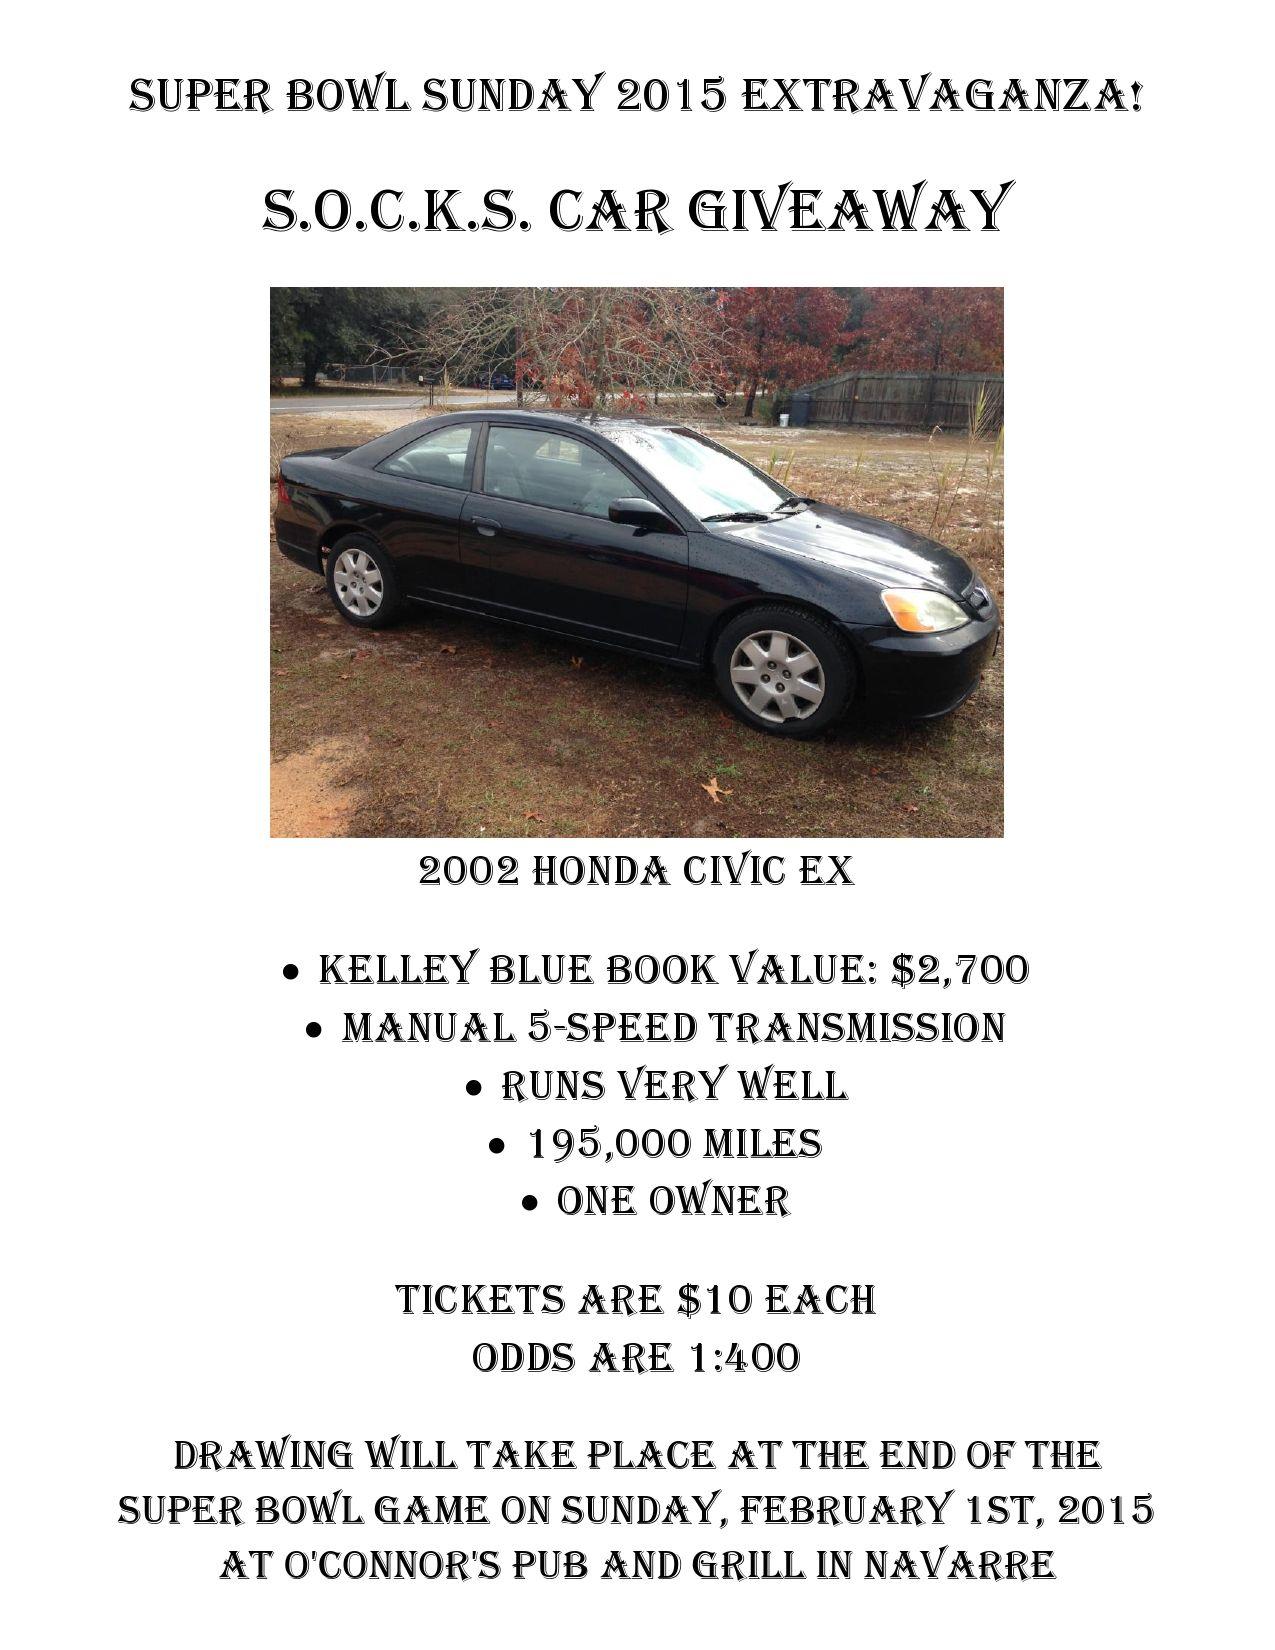 2015 Honda Civic Kbb : honda, civic, Could, Tickets, SOCKS, Thrift, Shop., Superbowl, Game,, Super, Bowl,, Sunday